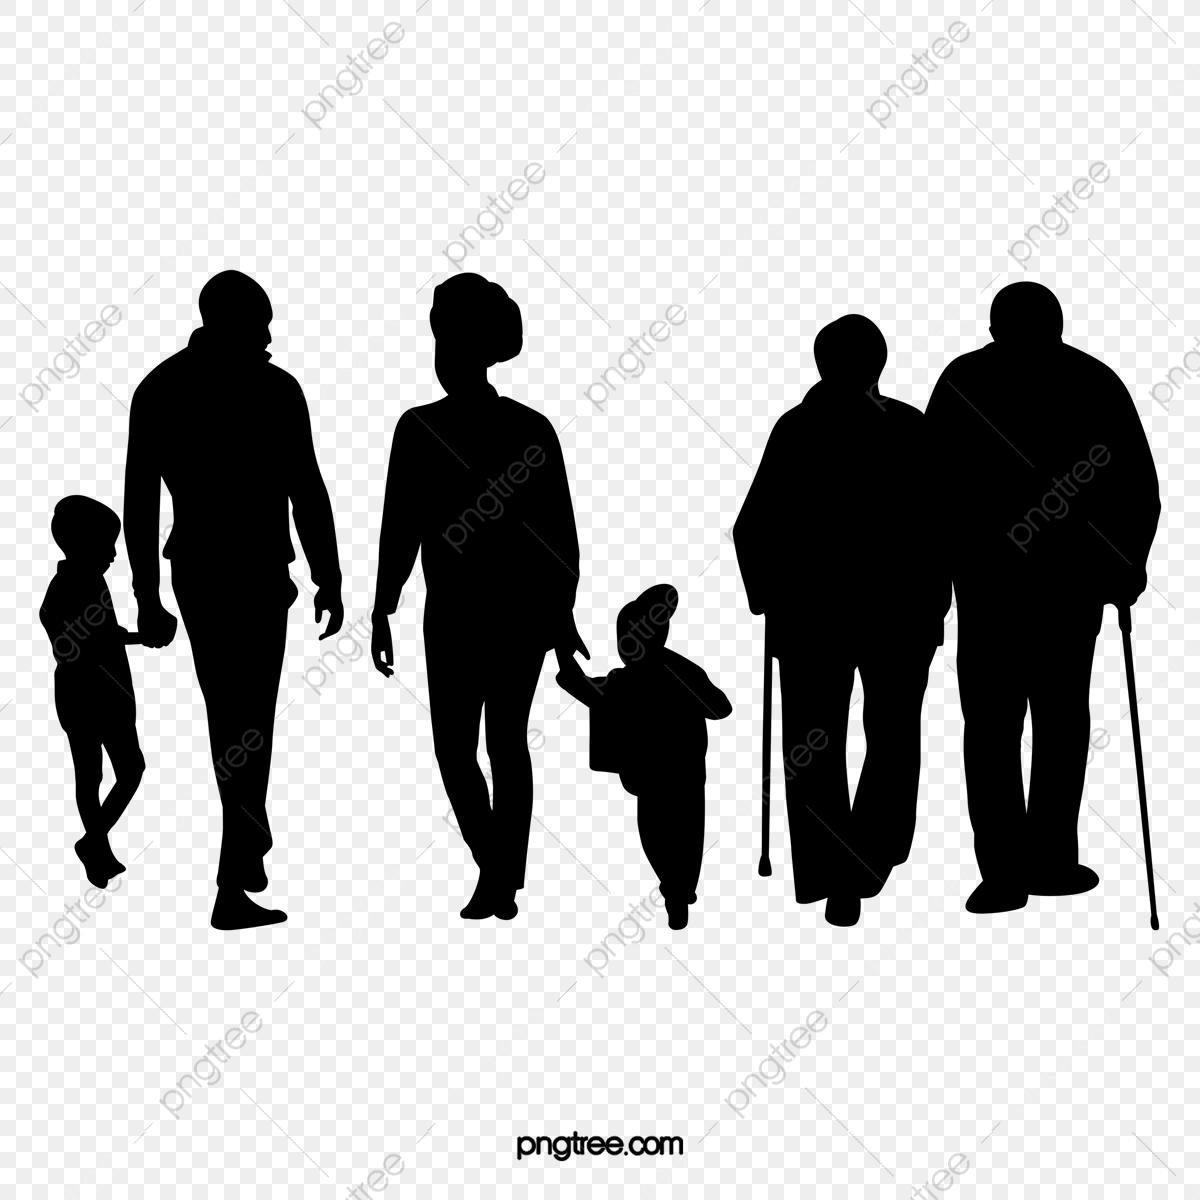 Black Family Silhouette Figures, Family Clipart, Silhouette Family.